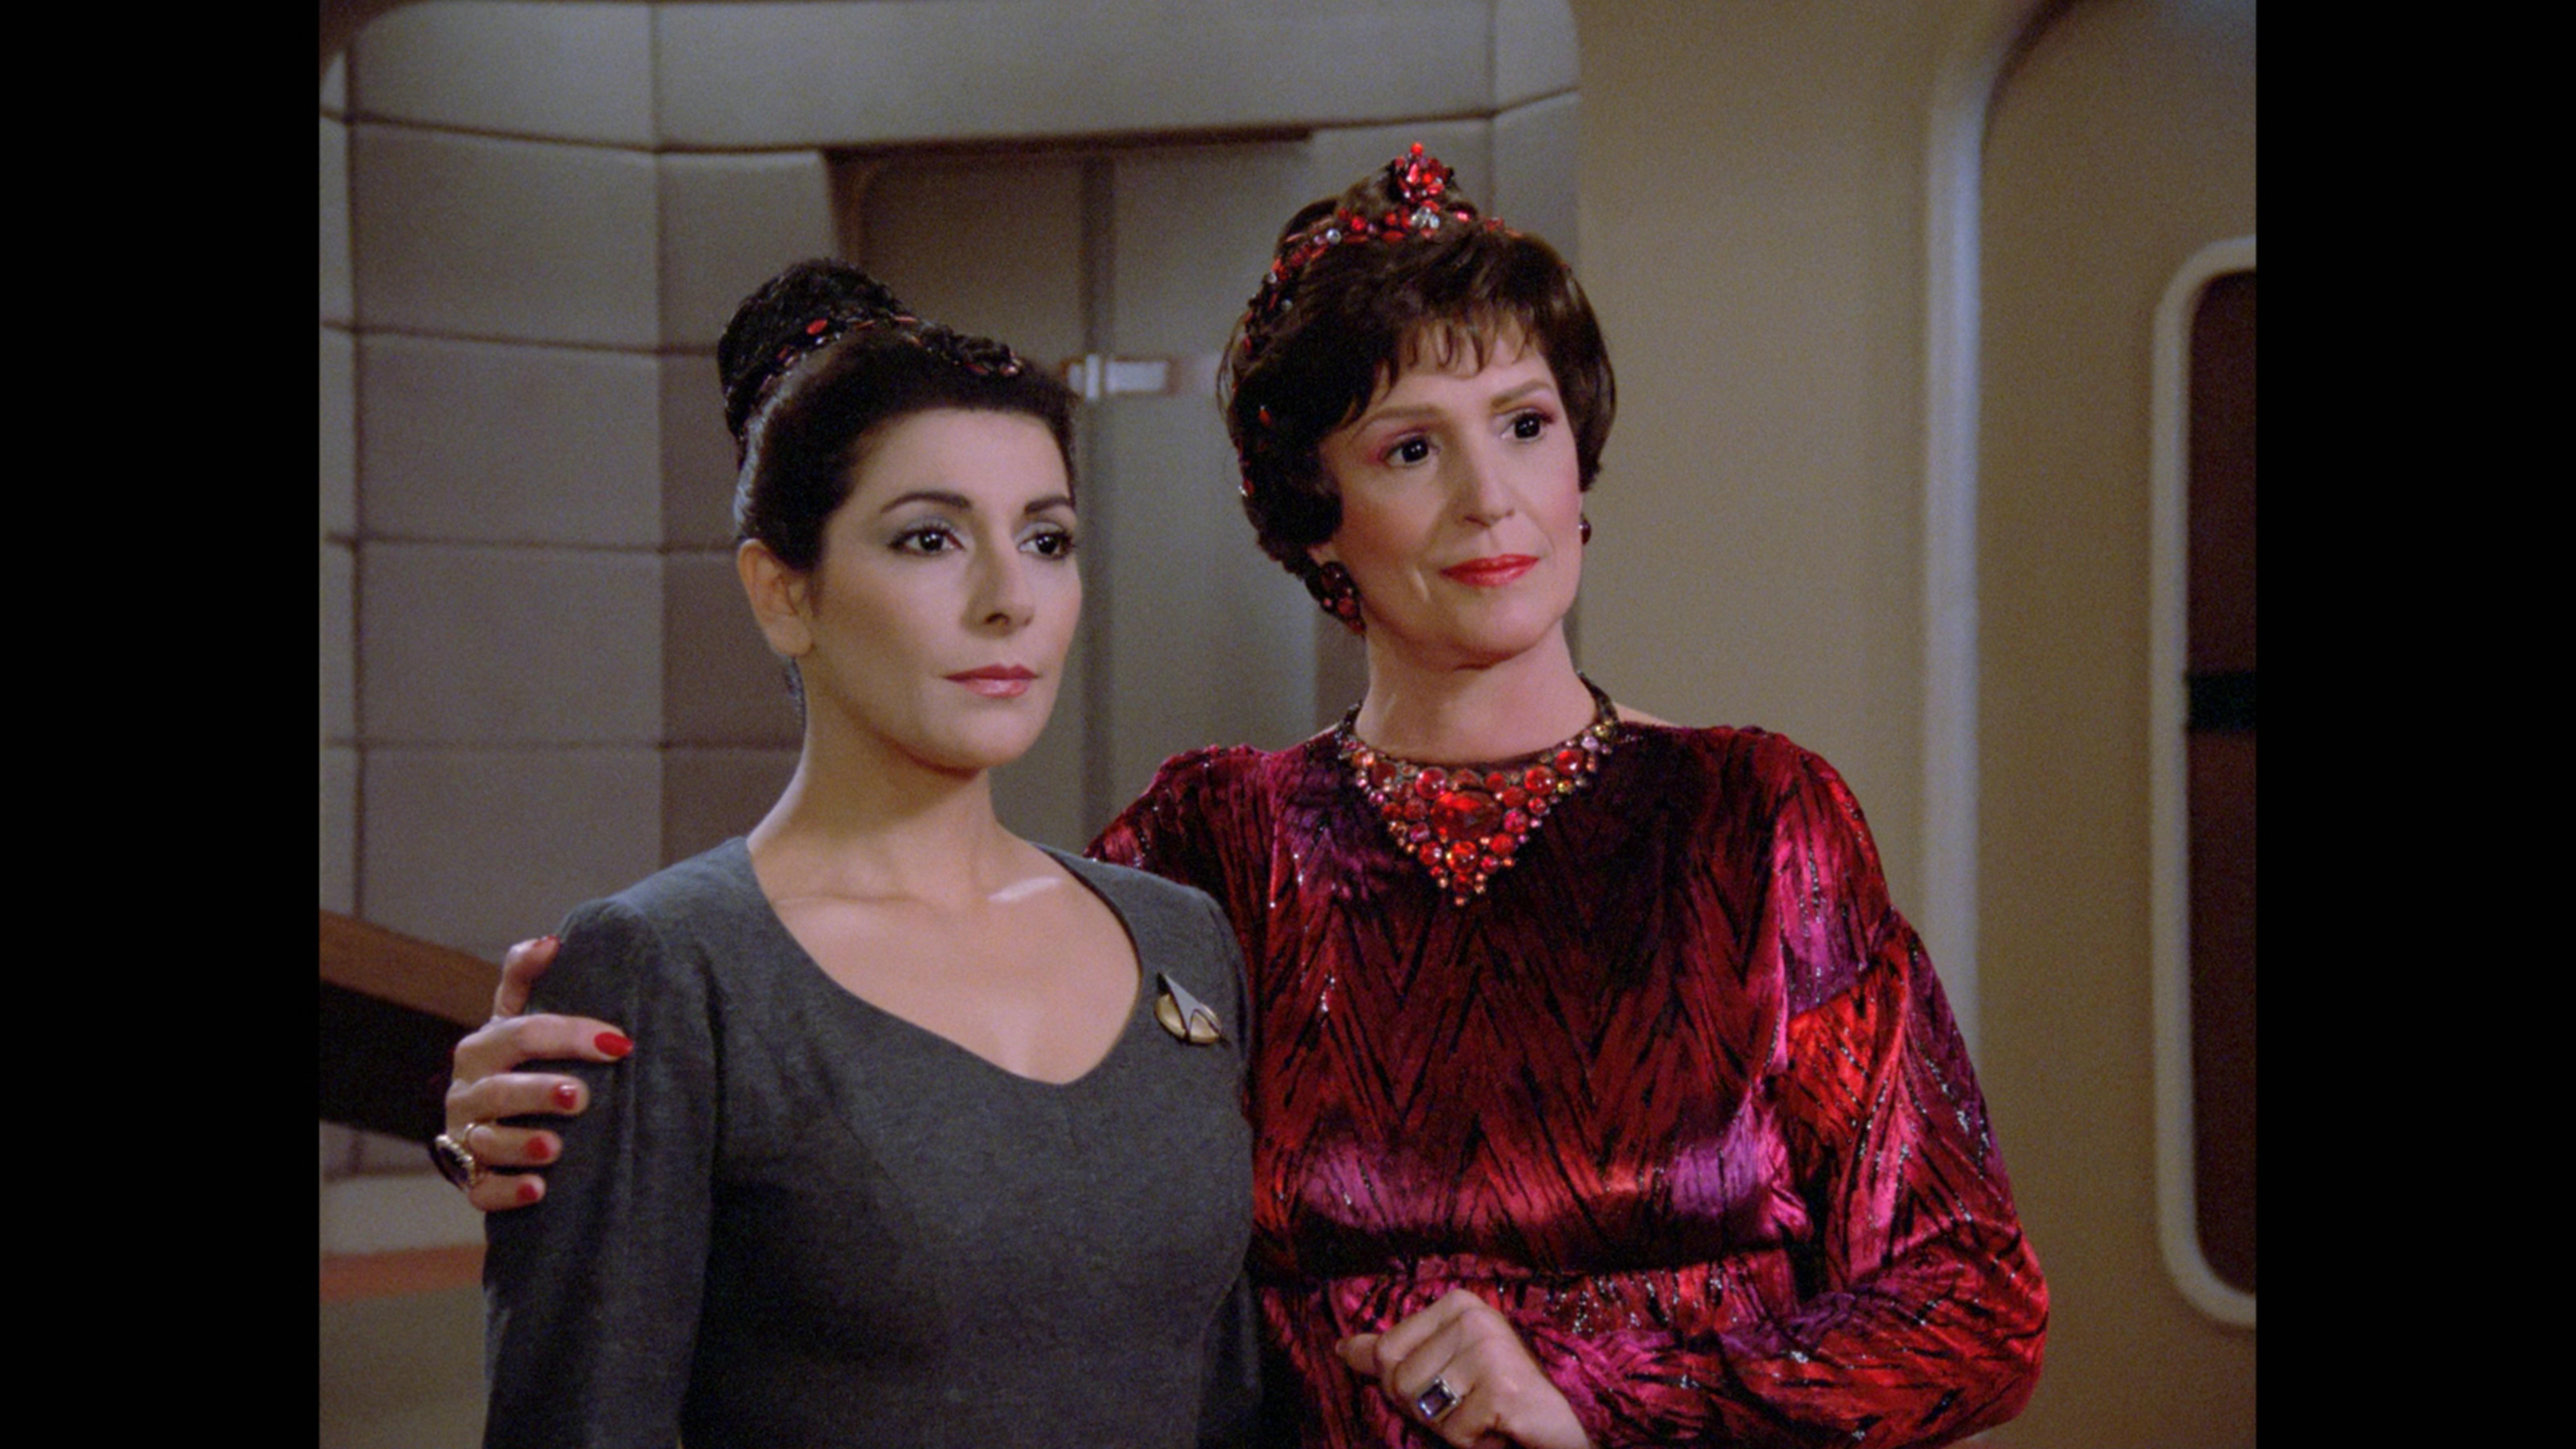 Marina Sirtis and Majel Barrett in Star Trek: The Next Generation (1987)